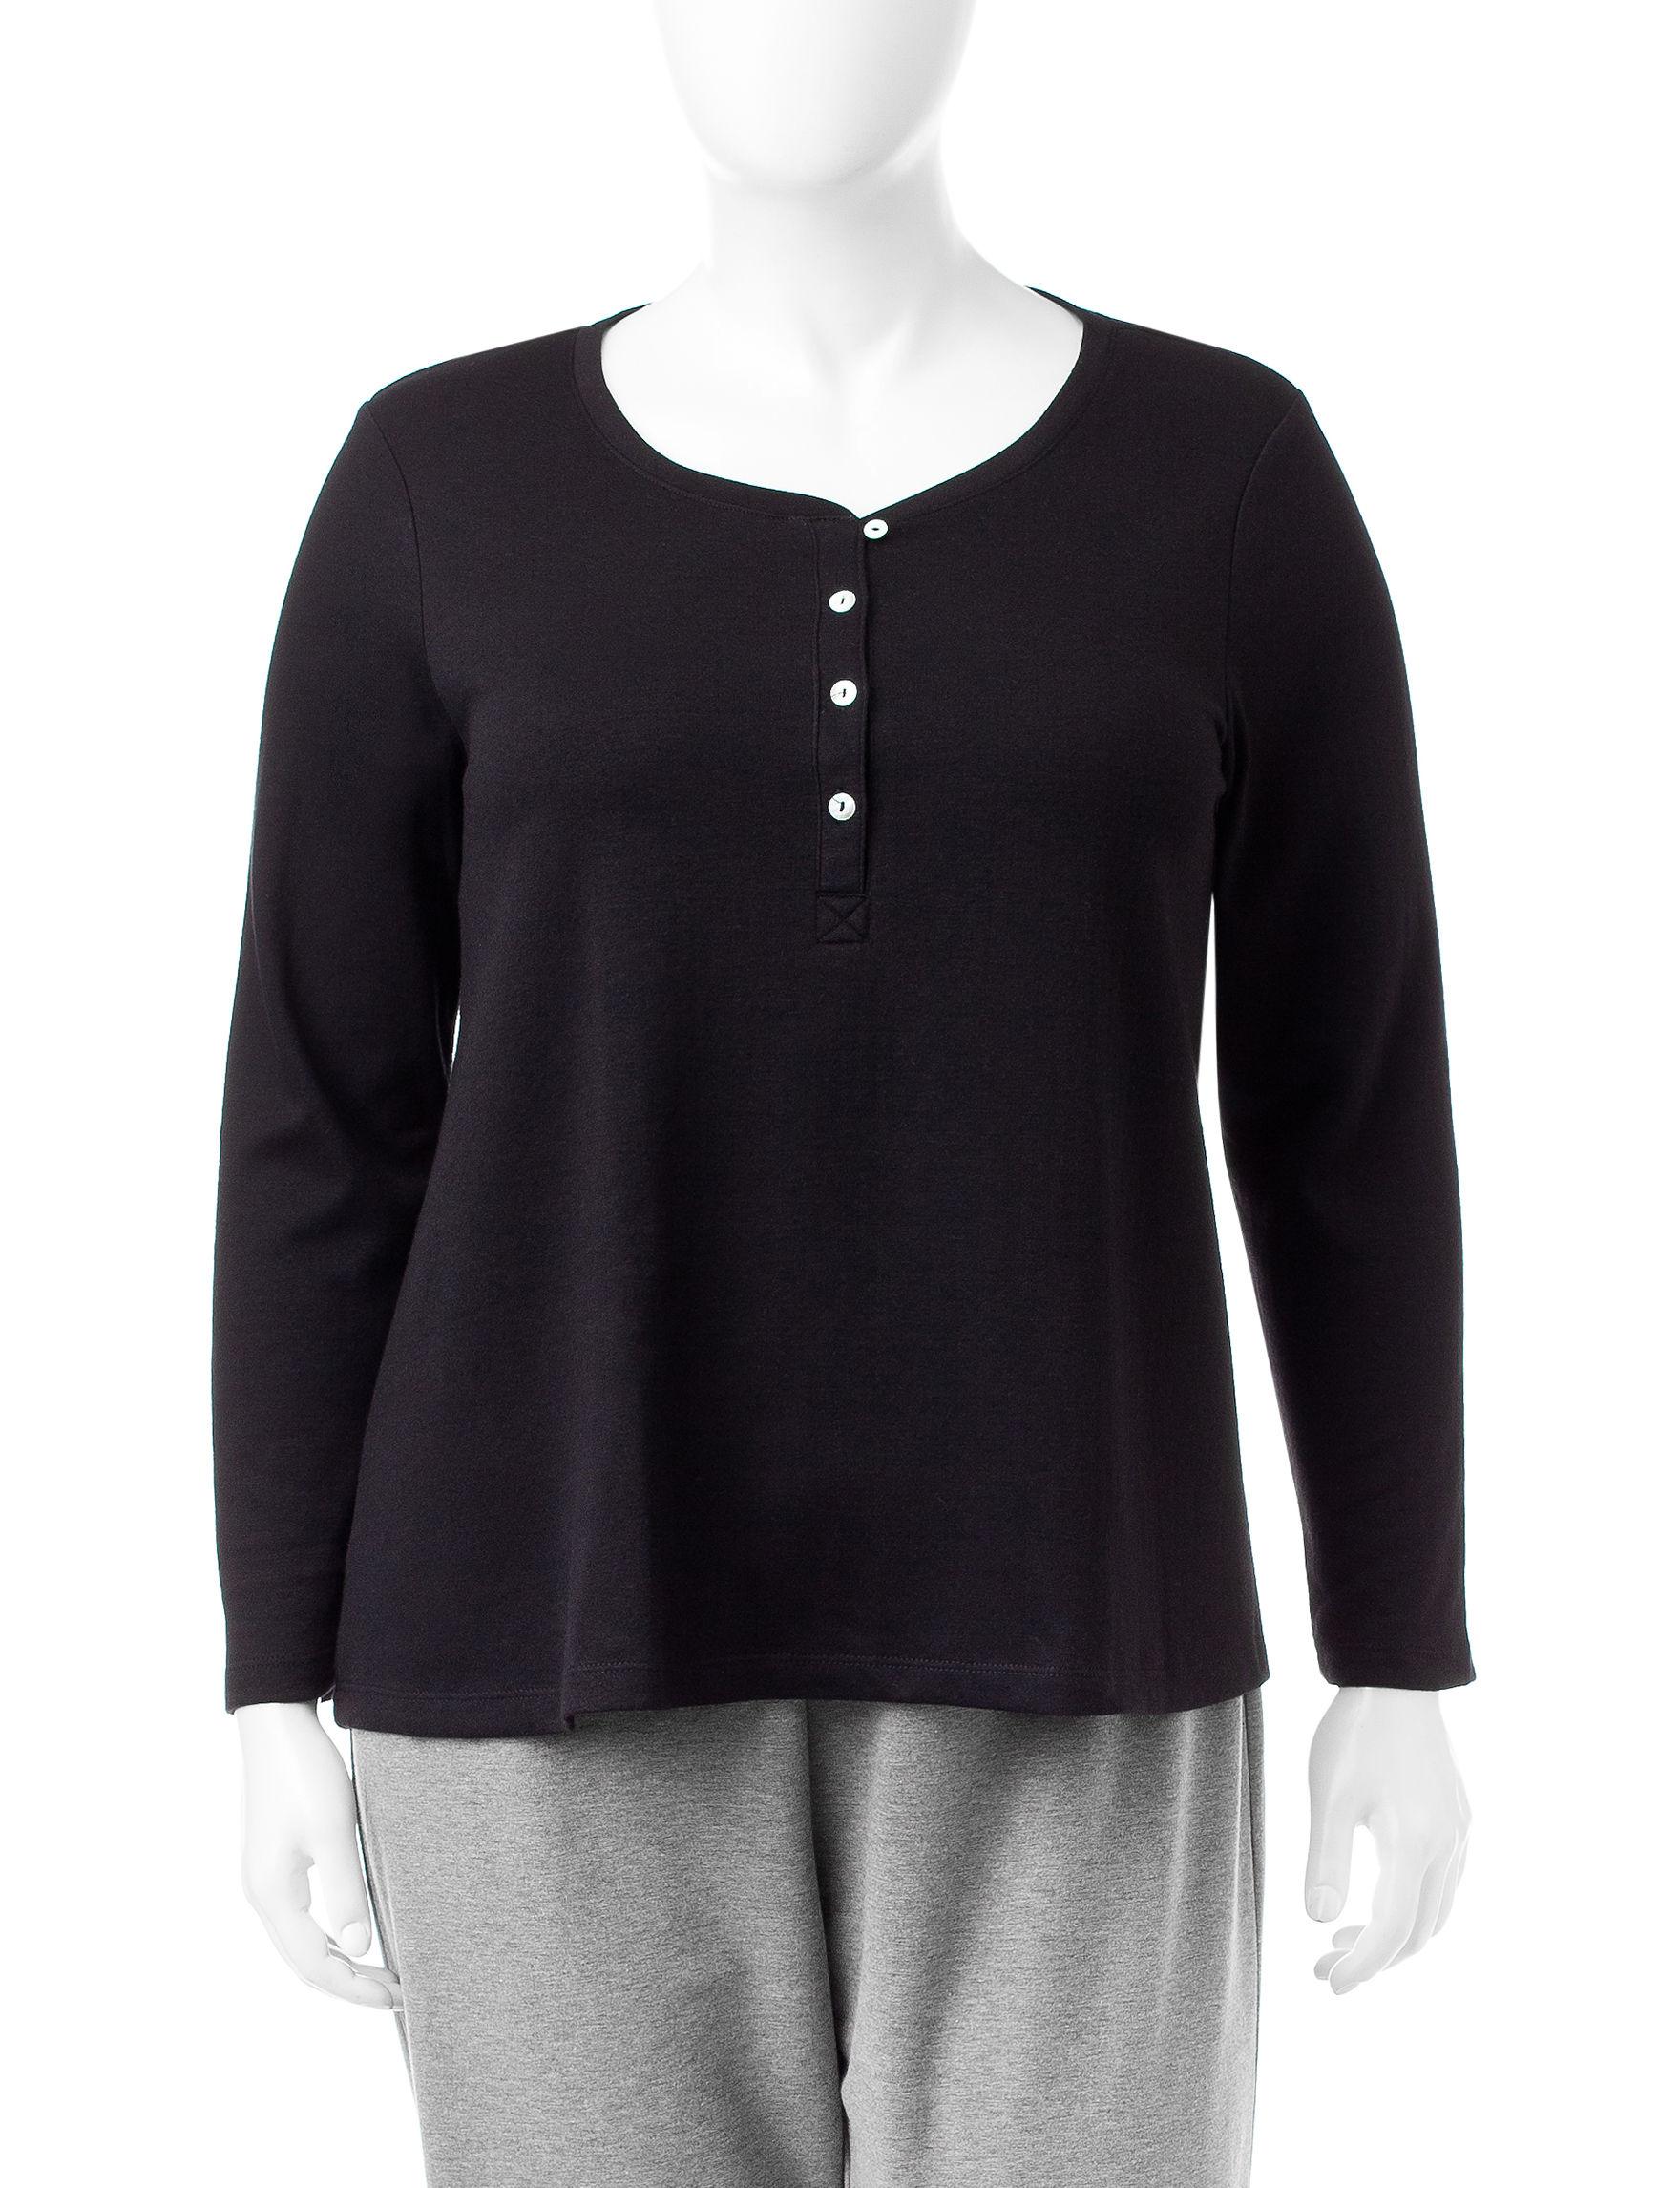 Hue Black Nightgowns & Sleep Shirts